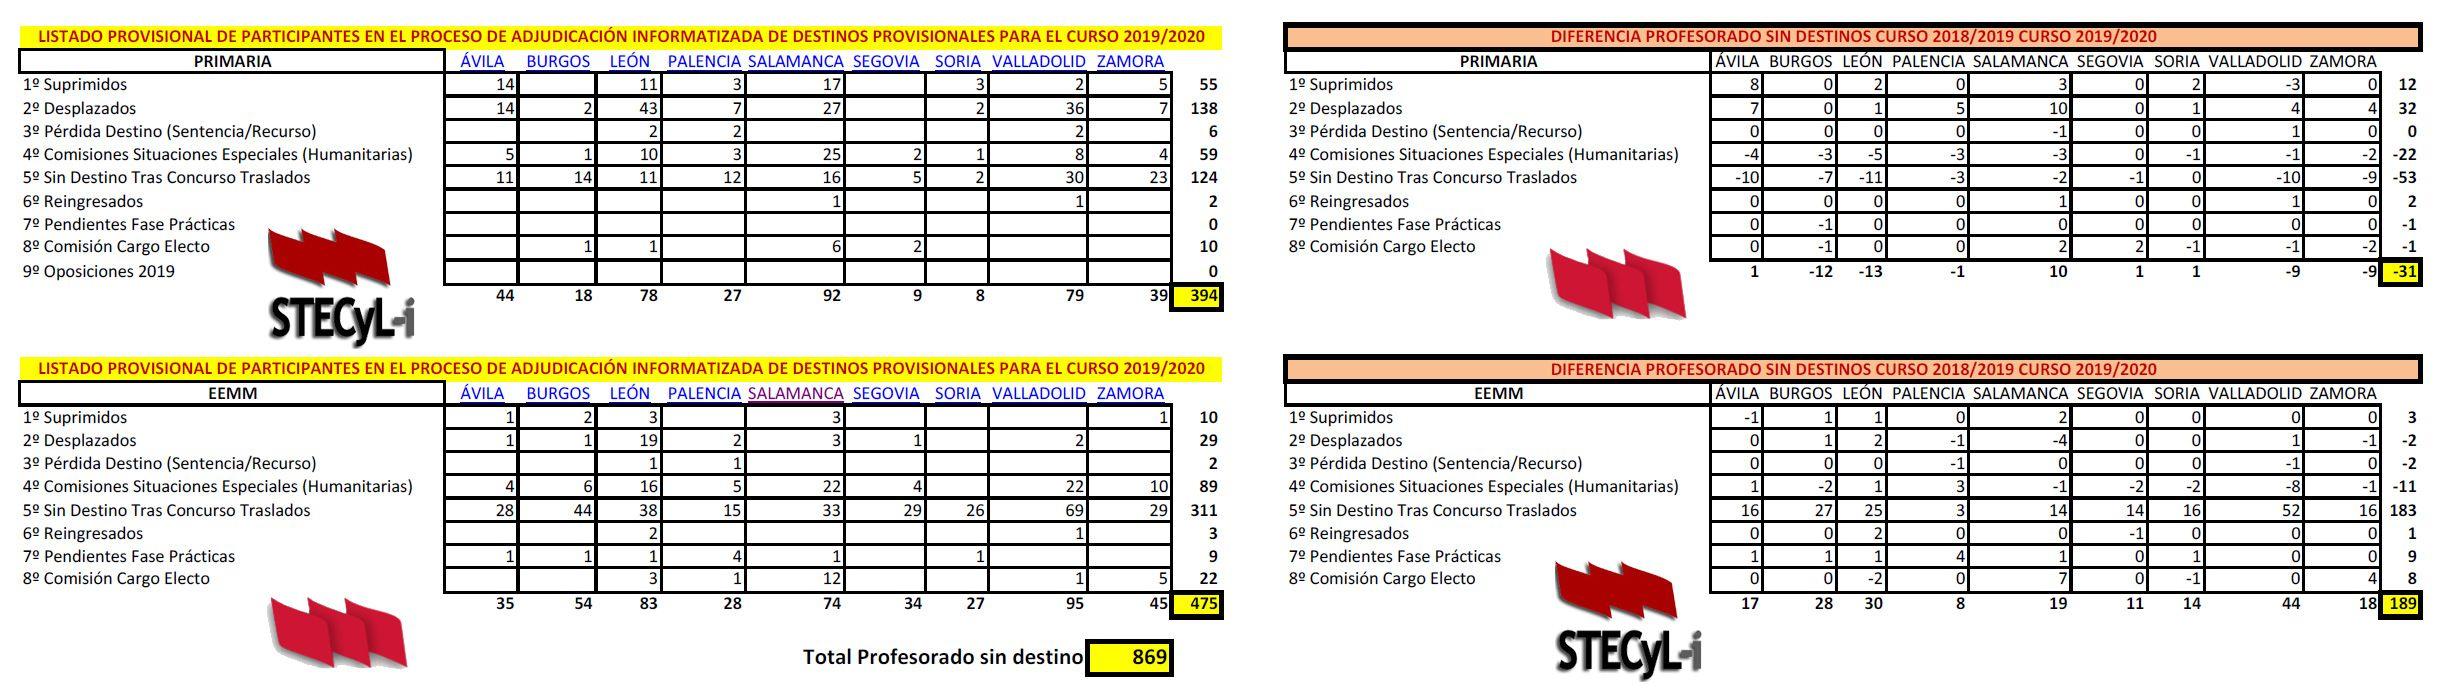 Cuadro-Profesorado-Sin-Destino-19-20